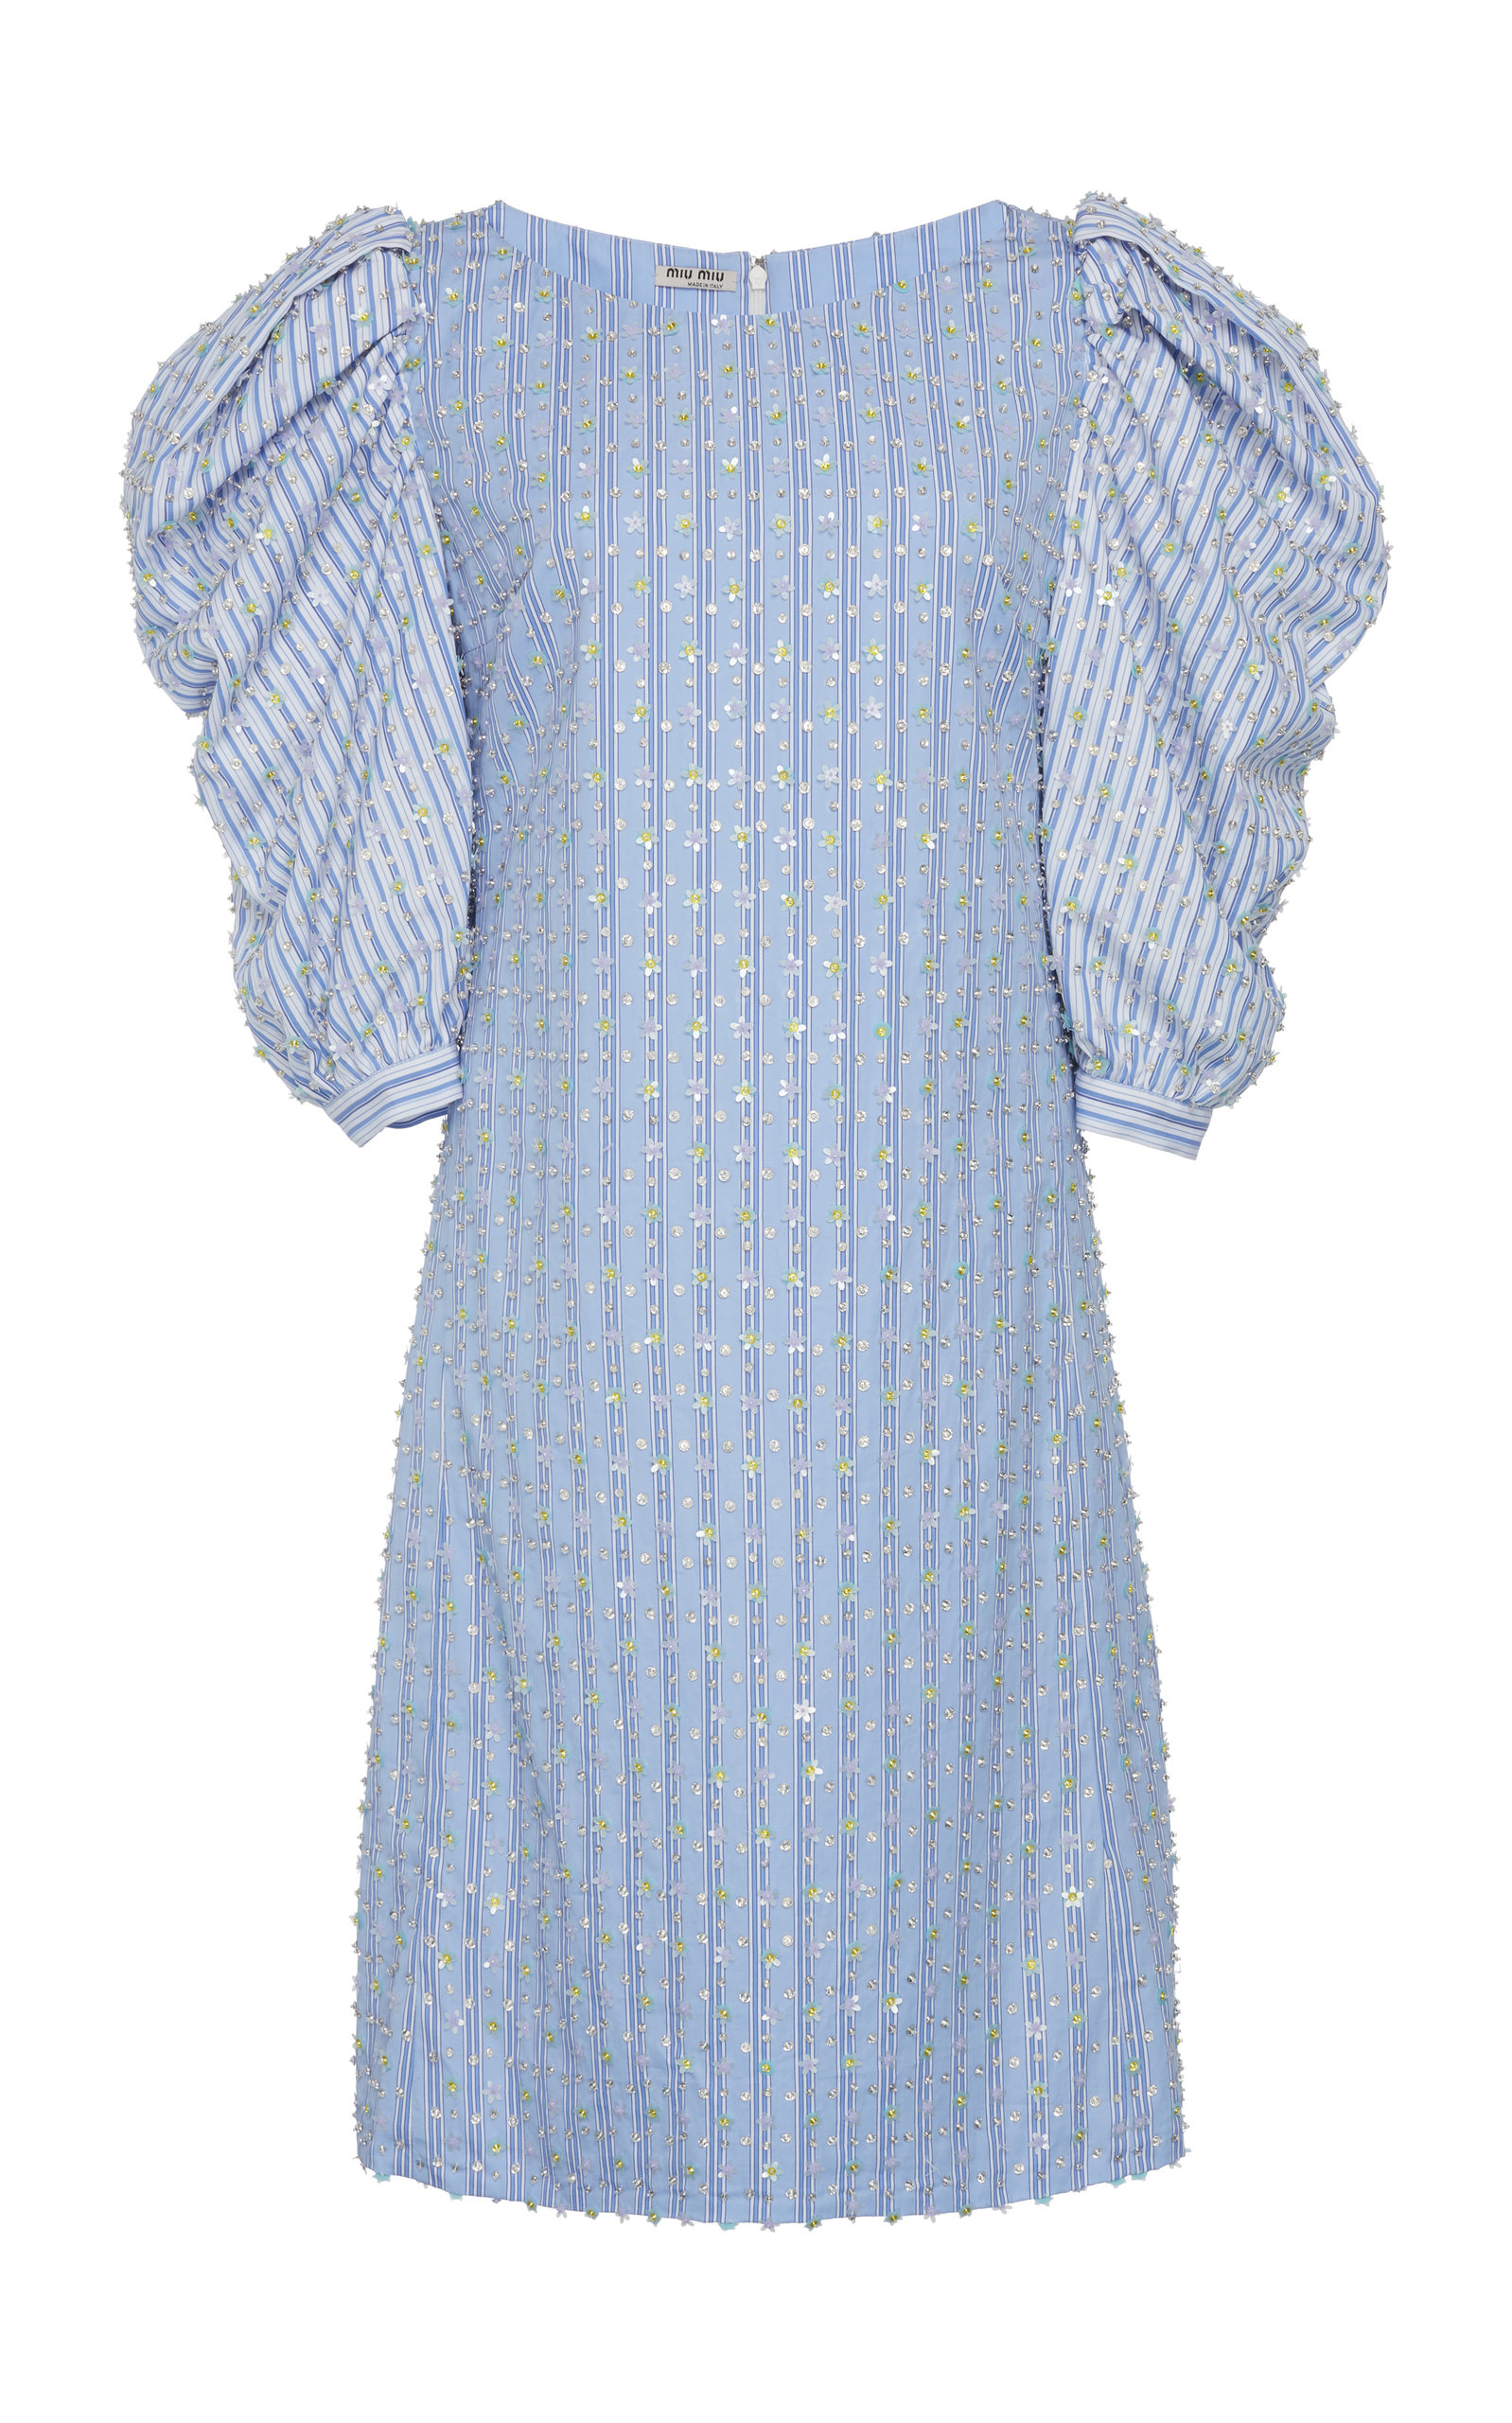 Buy Miu Miu Embellished Puff Sleeve Dress online, shop Miu Miu at the best price